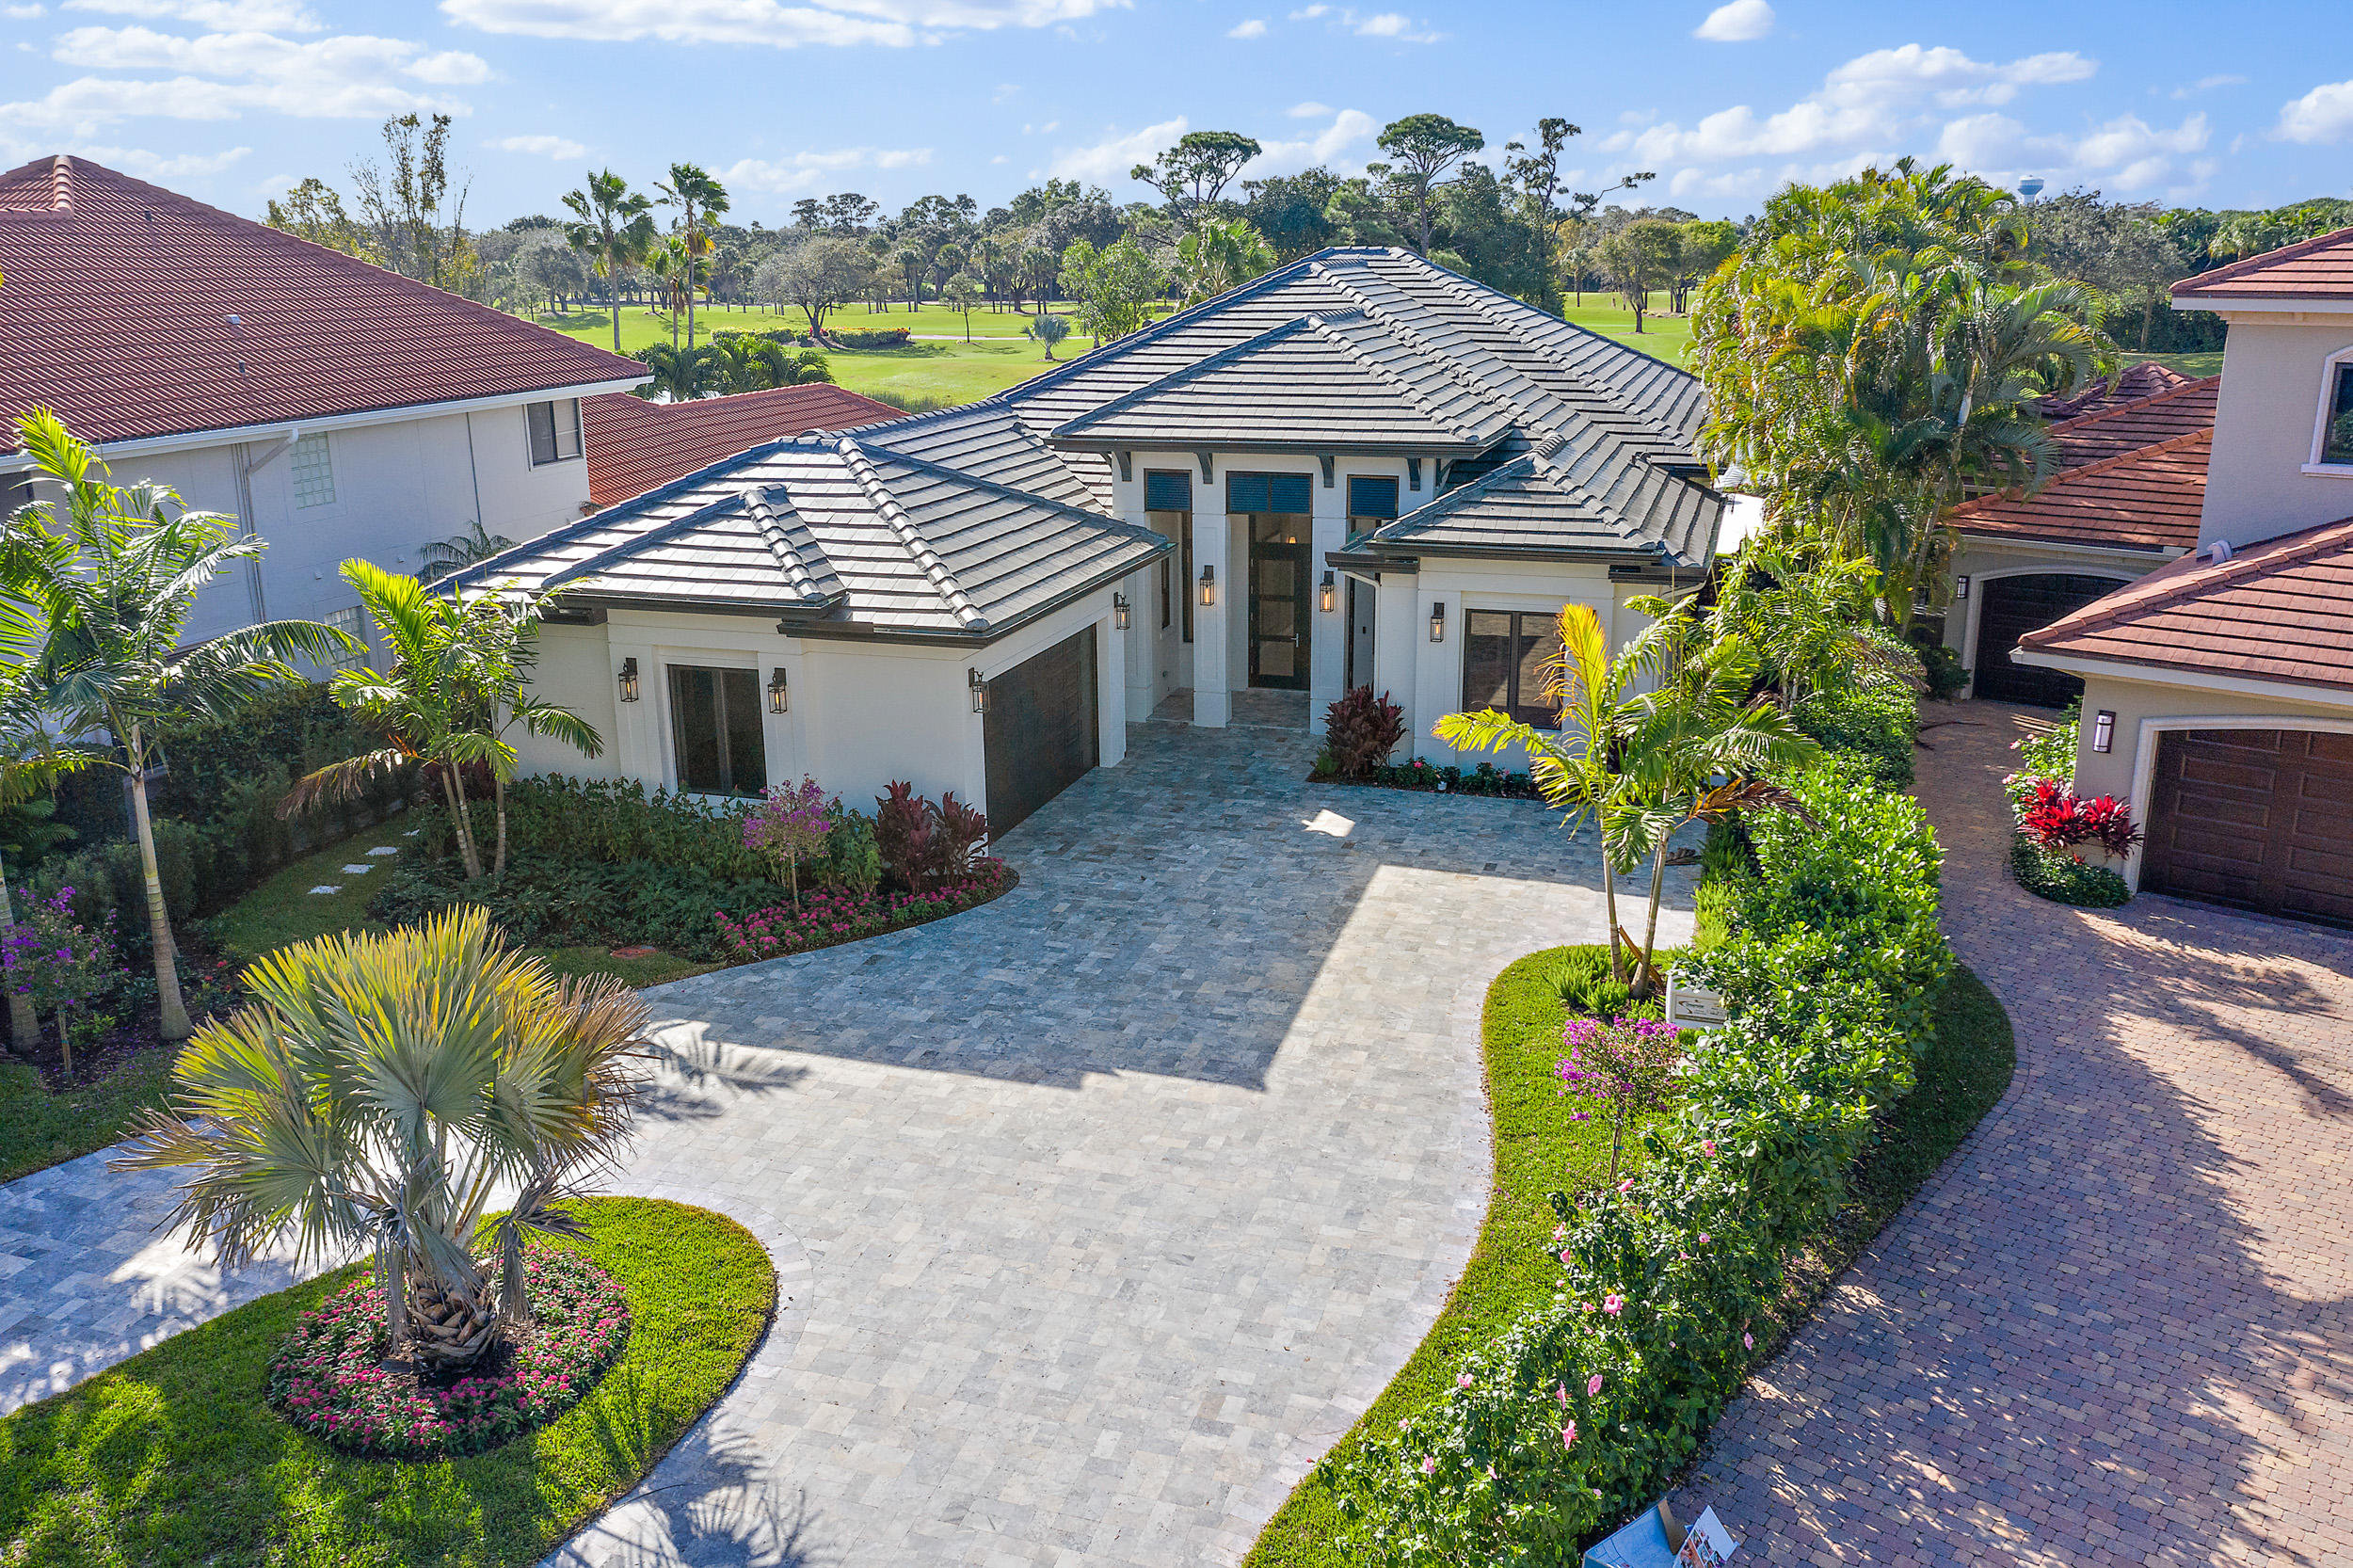 13693 Rivoli Drive, Palm Beach Gardens, Florida 33410, 3 Bedrooms Bedrooms, ,3.1 BathroomsBathrooms,A,Single family,Rivoli,RX-10529079